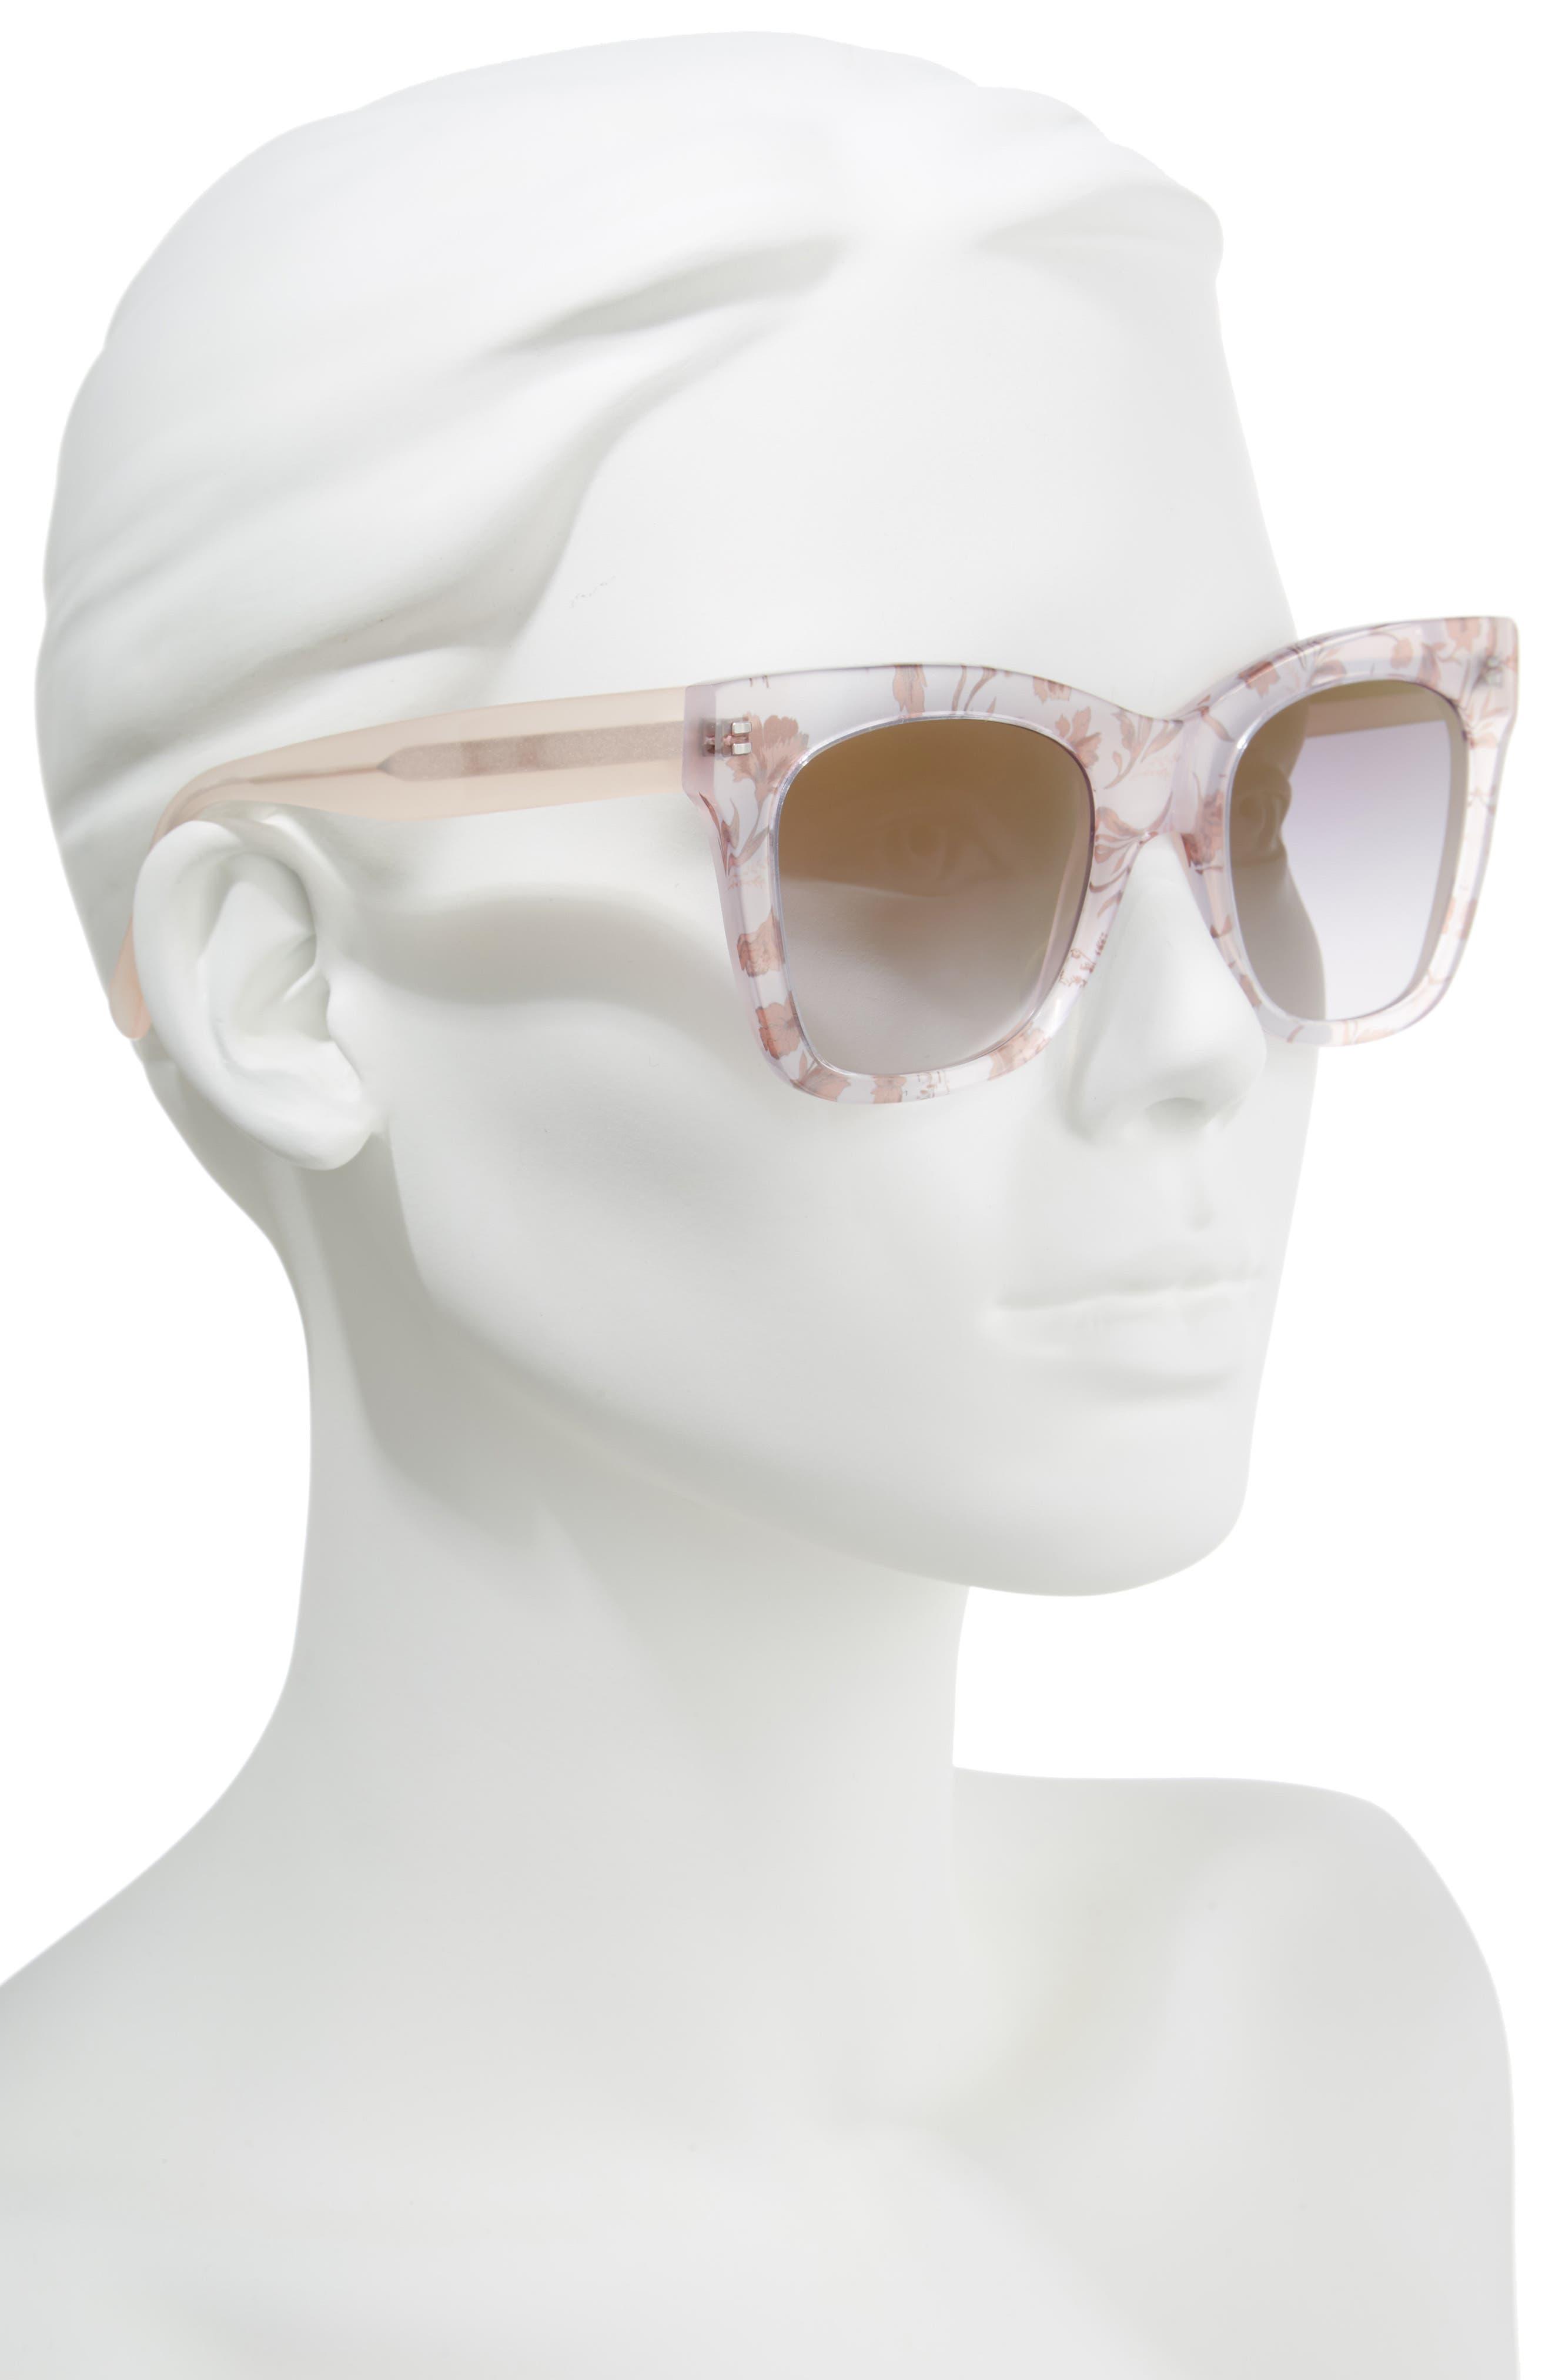 D'BLANC Beach Vida 52mm Sunglasses,                             Alternate thumbnail 2, color,                             Something Nice